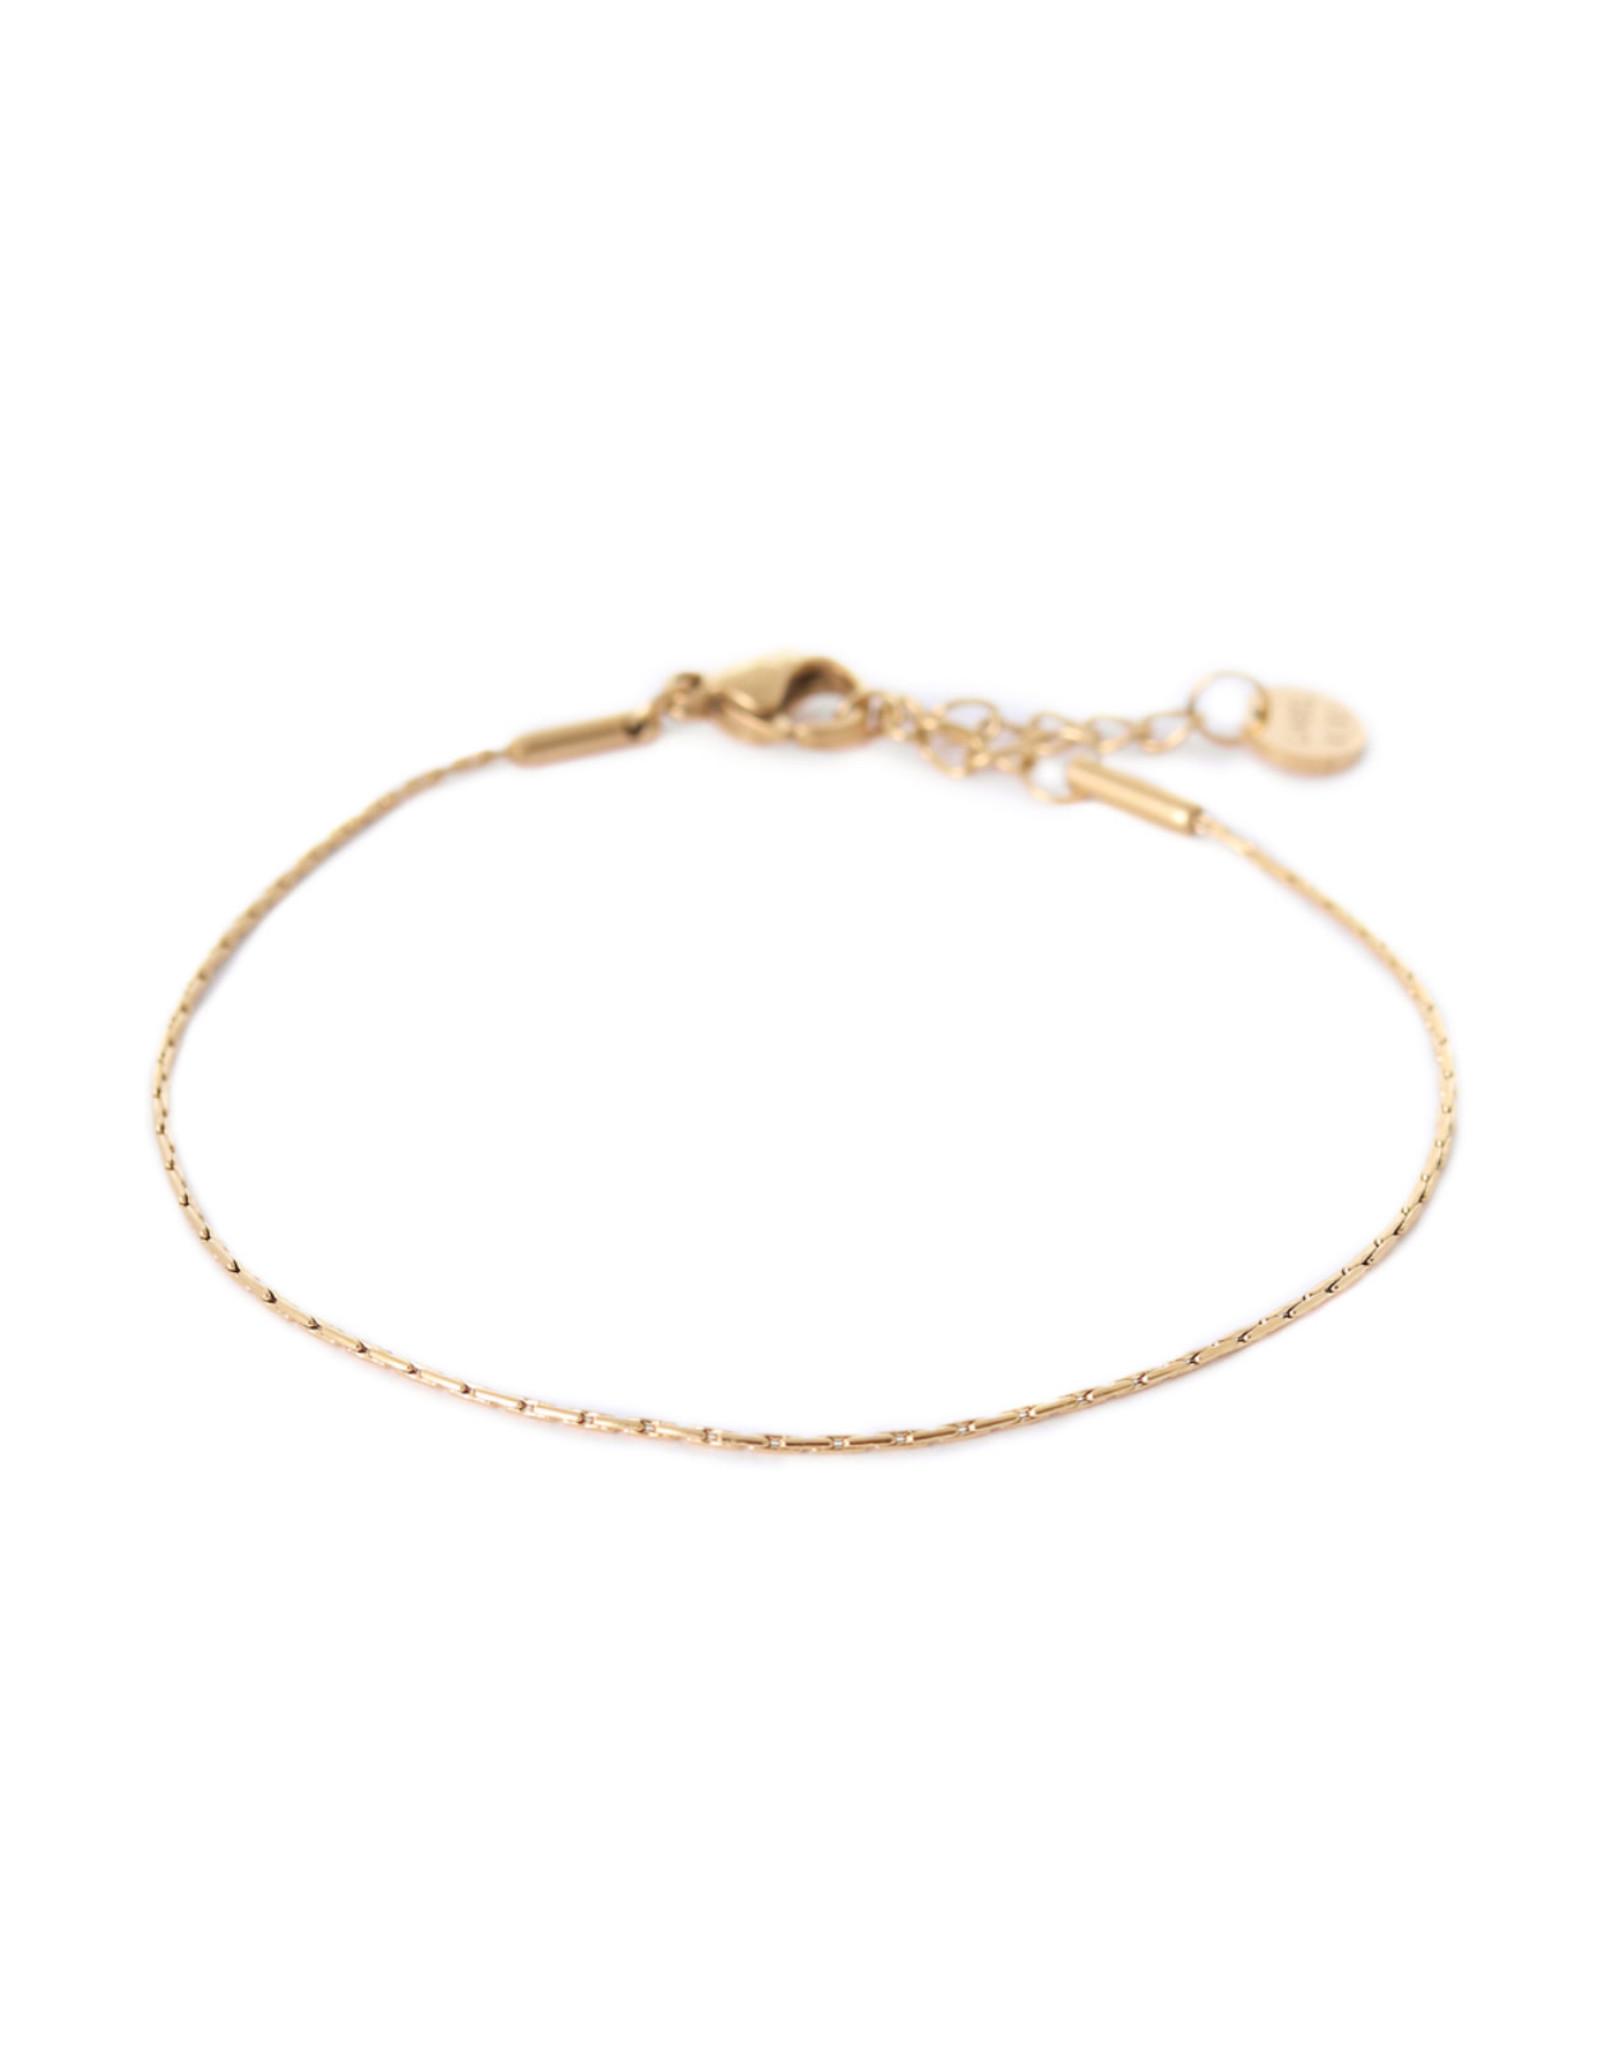 Label Kiki Armband - Tiny Bracelet Gold  - RVS - 16,5cm + 2,50 verlengketting